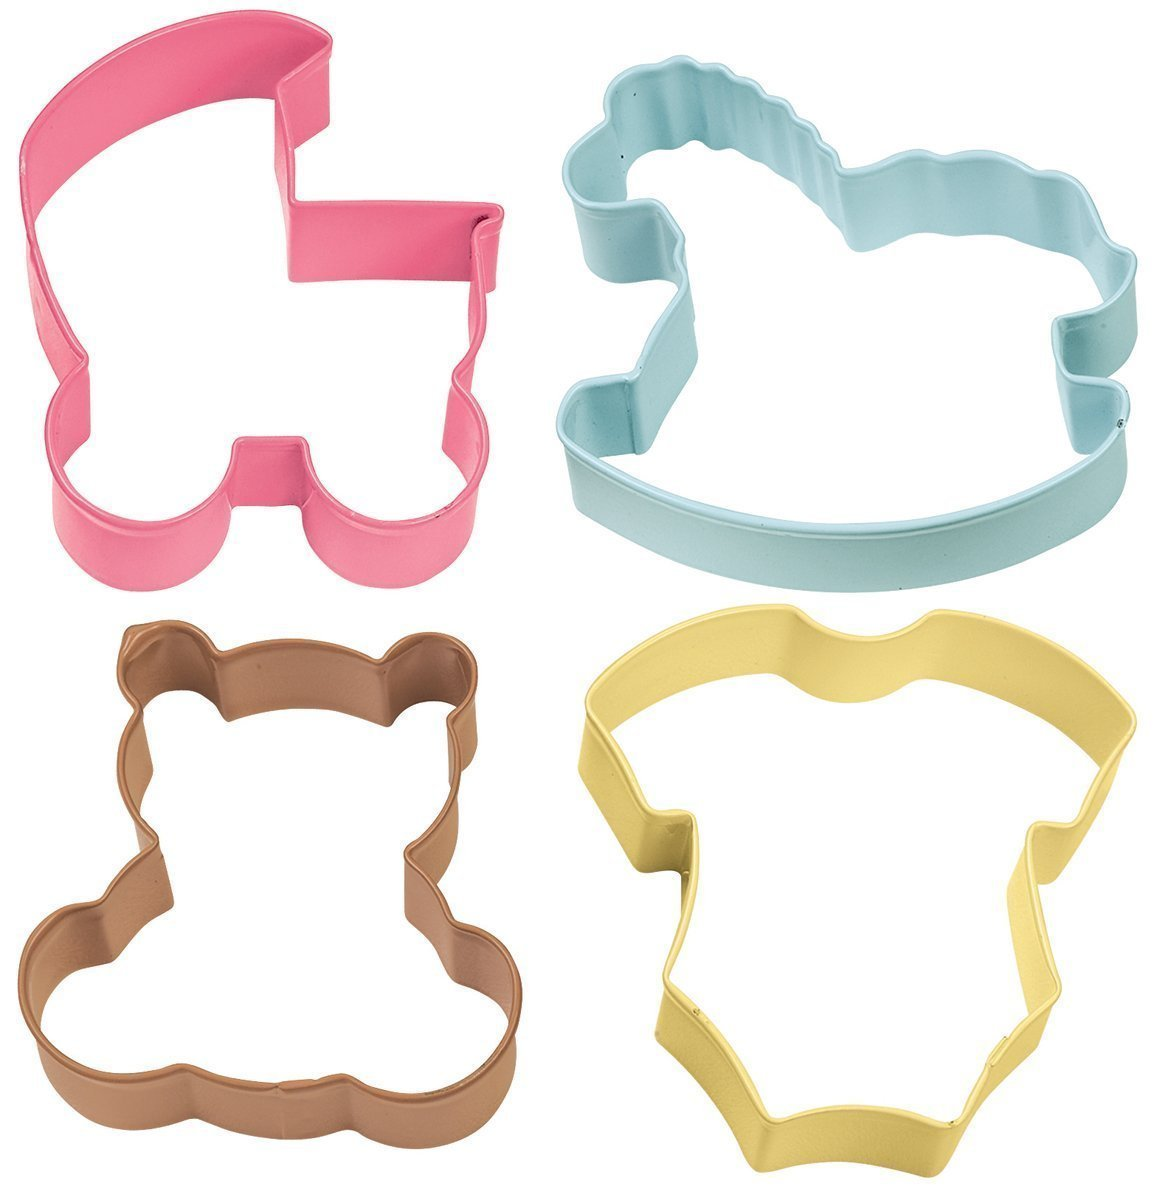 Wilton Set of 4 Baby Cutters -Σετ 4 -Μωρού. Pram, Onesie, Rocking Horse & Teddy Bear  καρότσι, ζιπουνάκι, άλογο, αρκουδάκι 7.6εκ